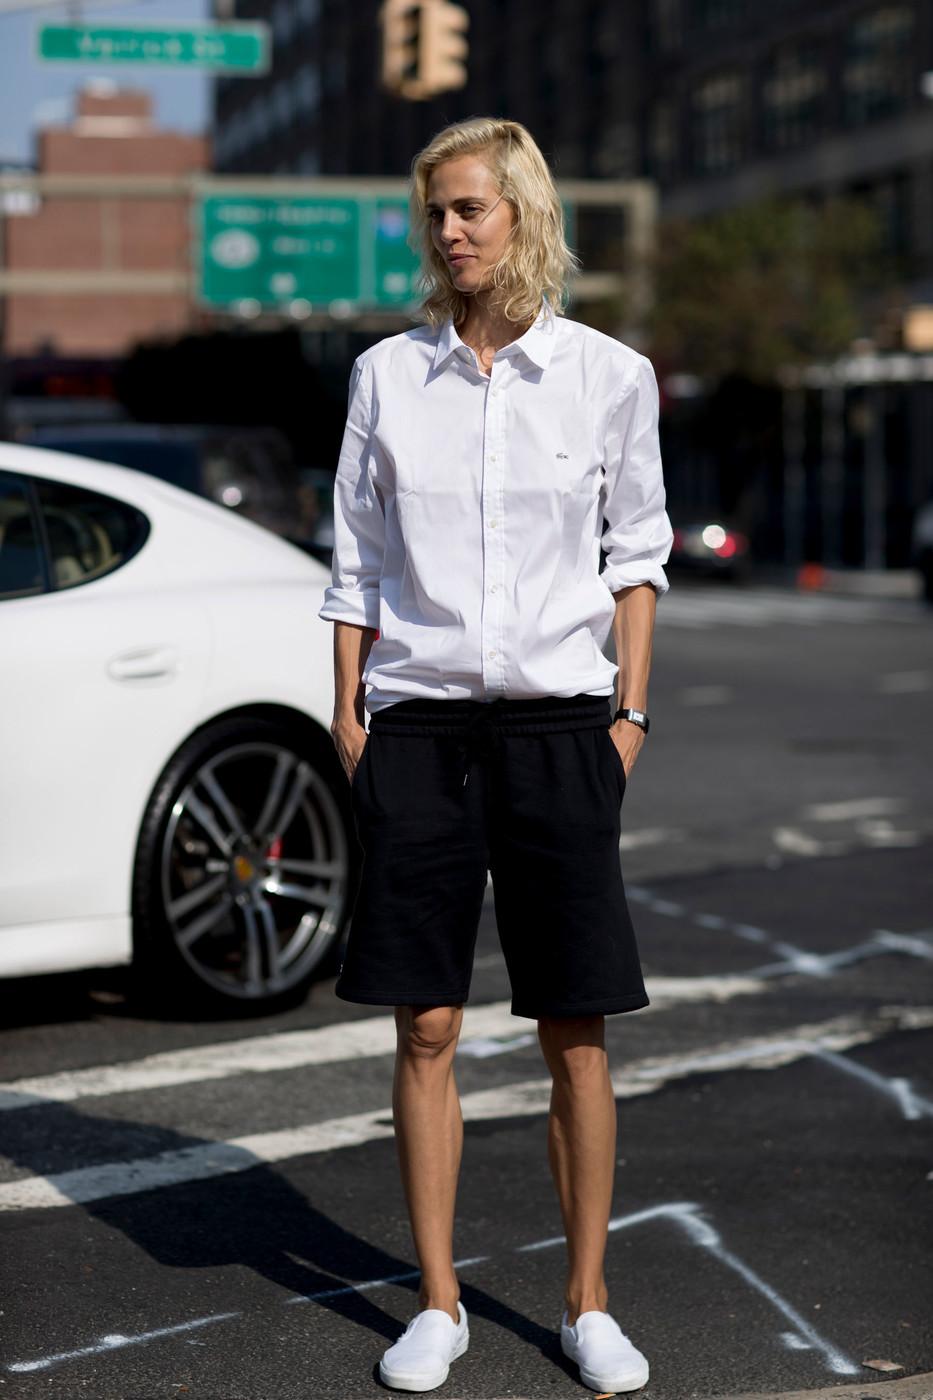 Street Style: Aymeline Valade's Boyish Off-Duty Look